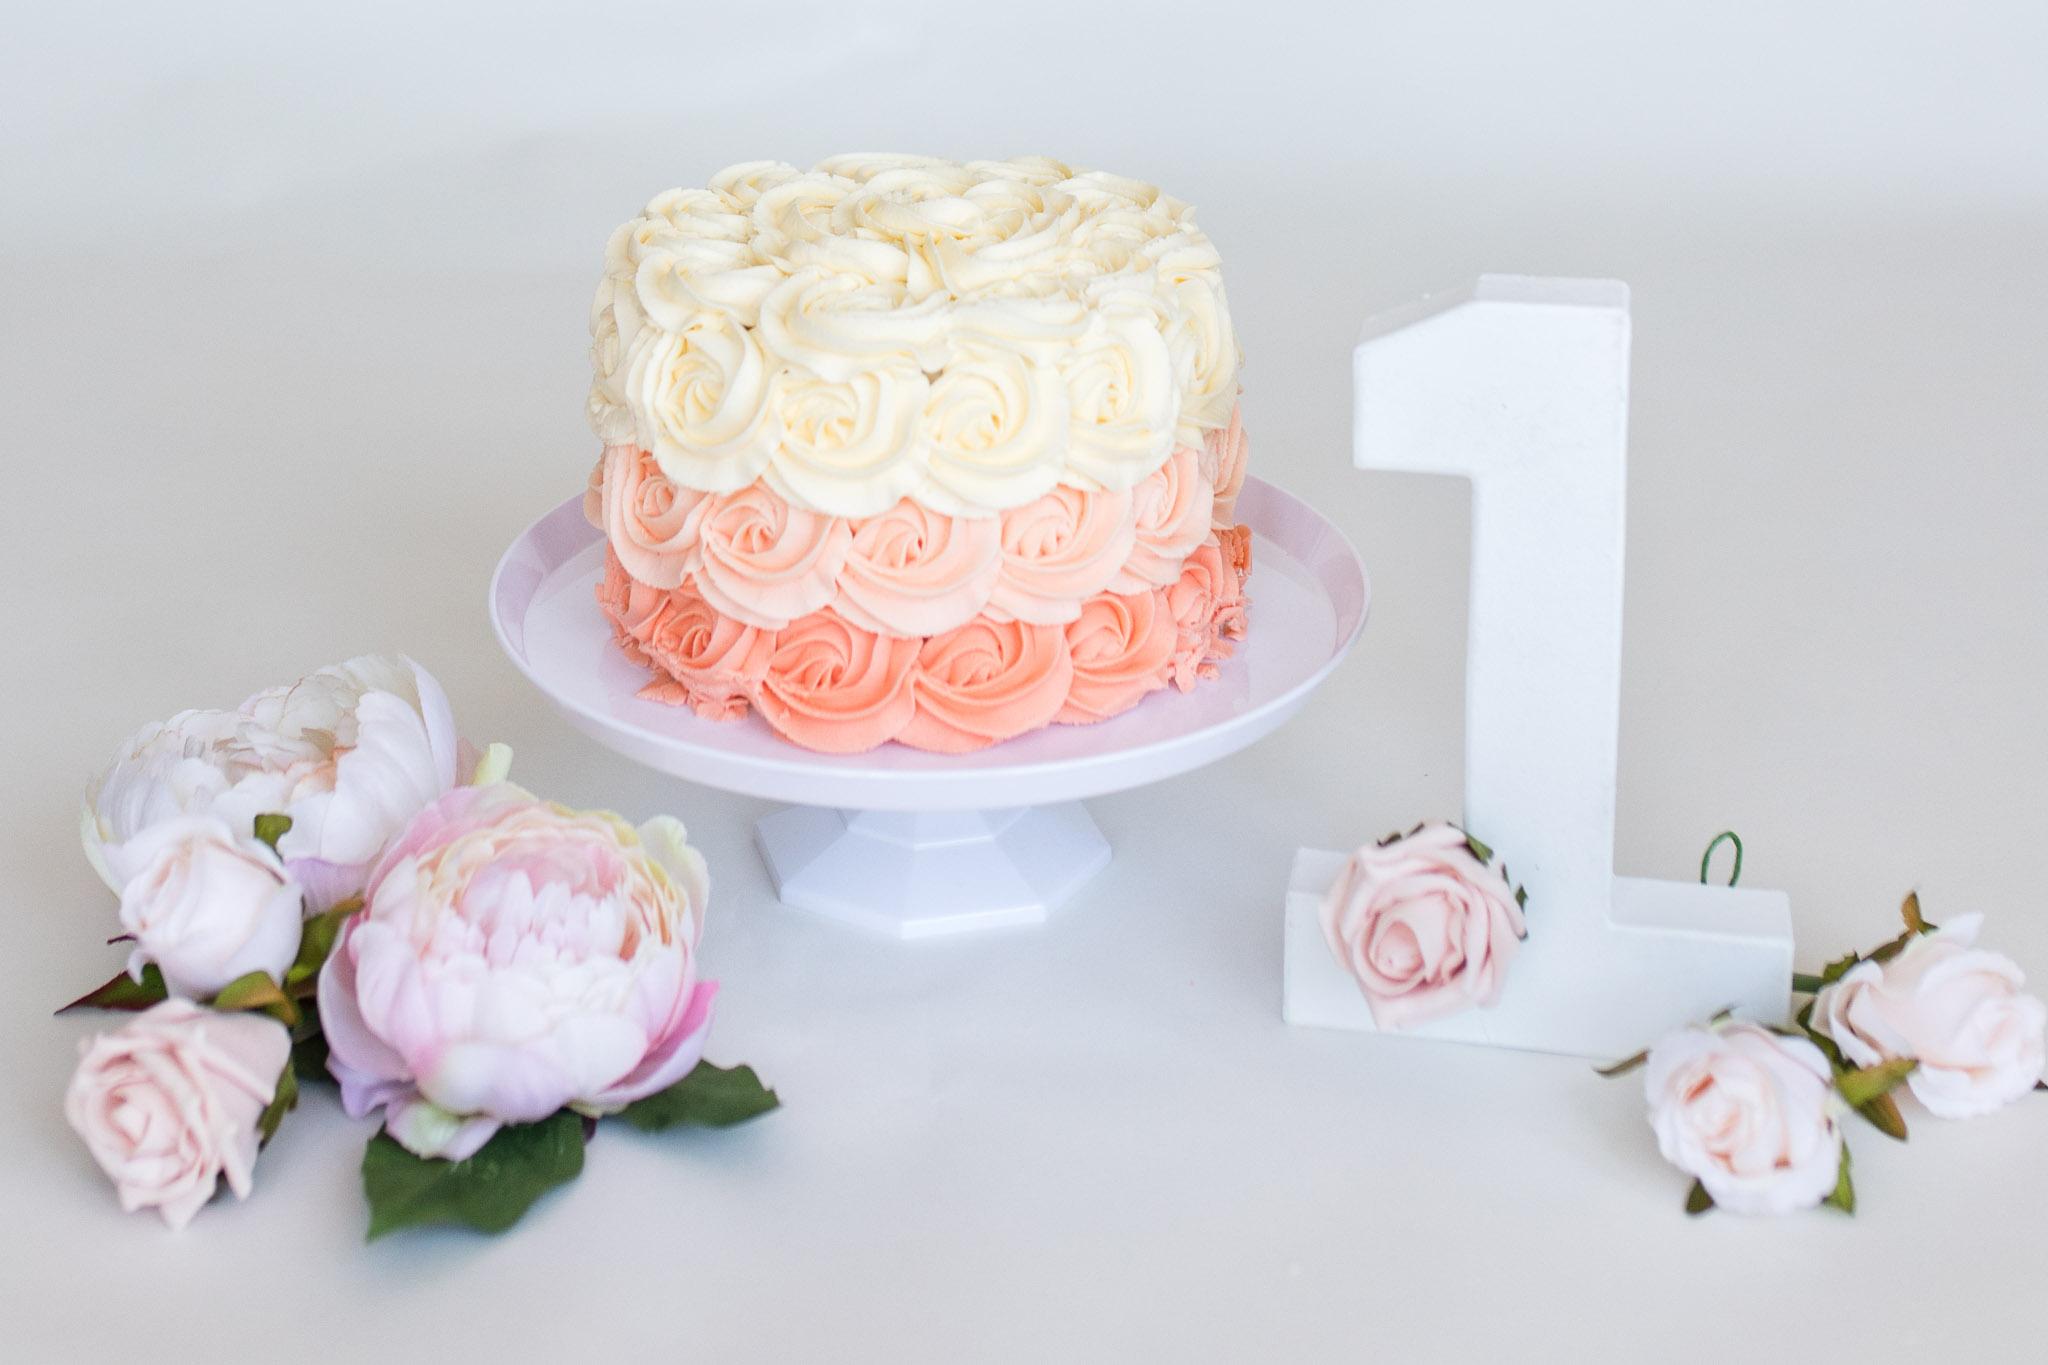 cake smash aberdeen - neeshas bakes cake peach colours - debbie dee photography